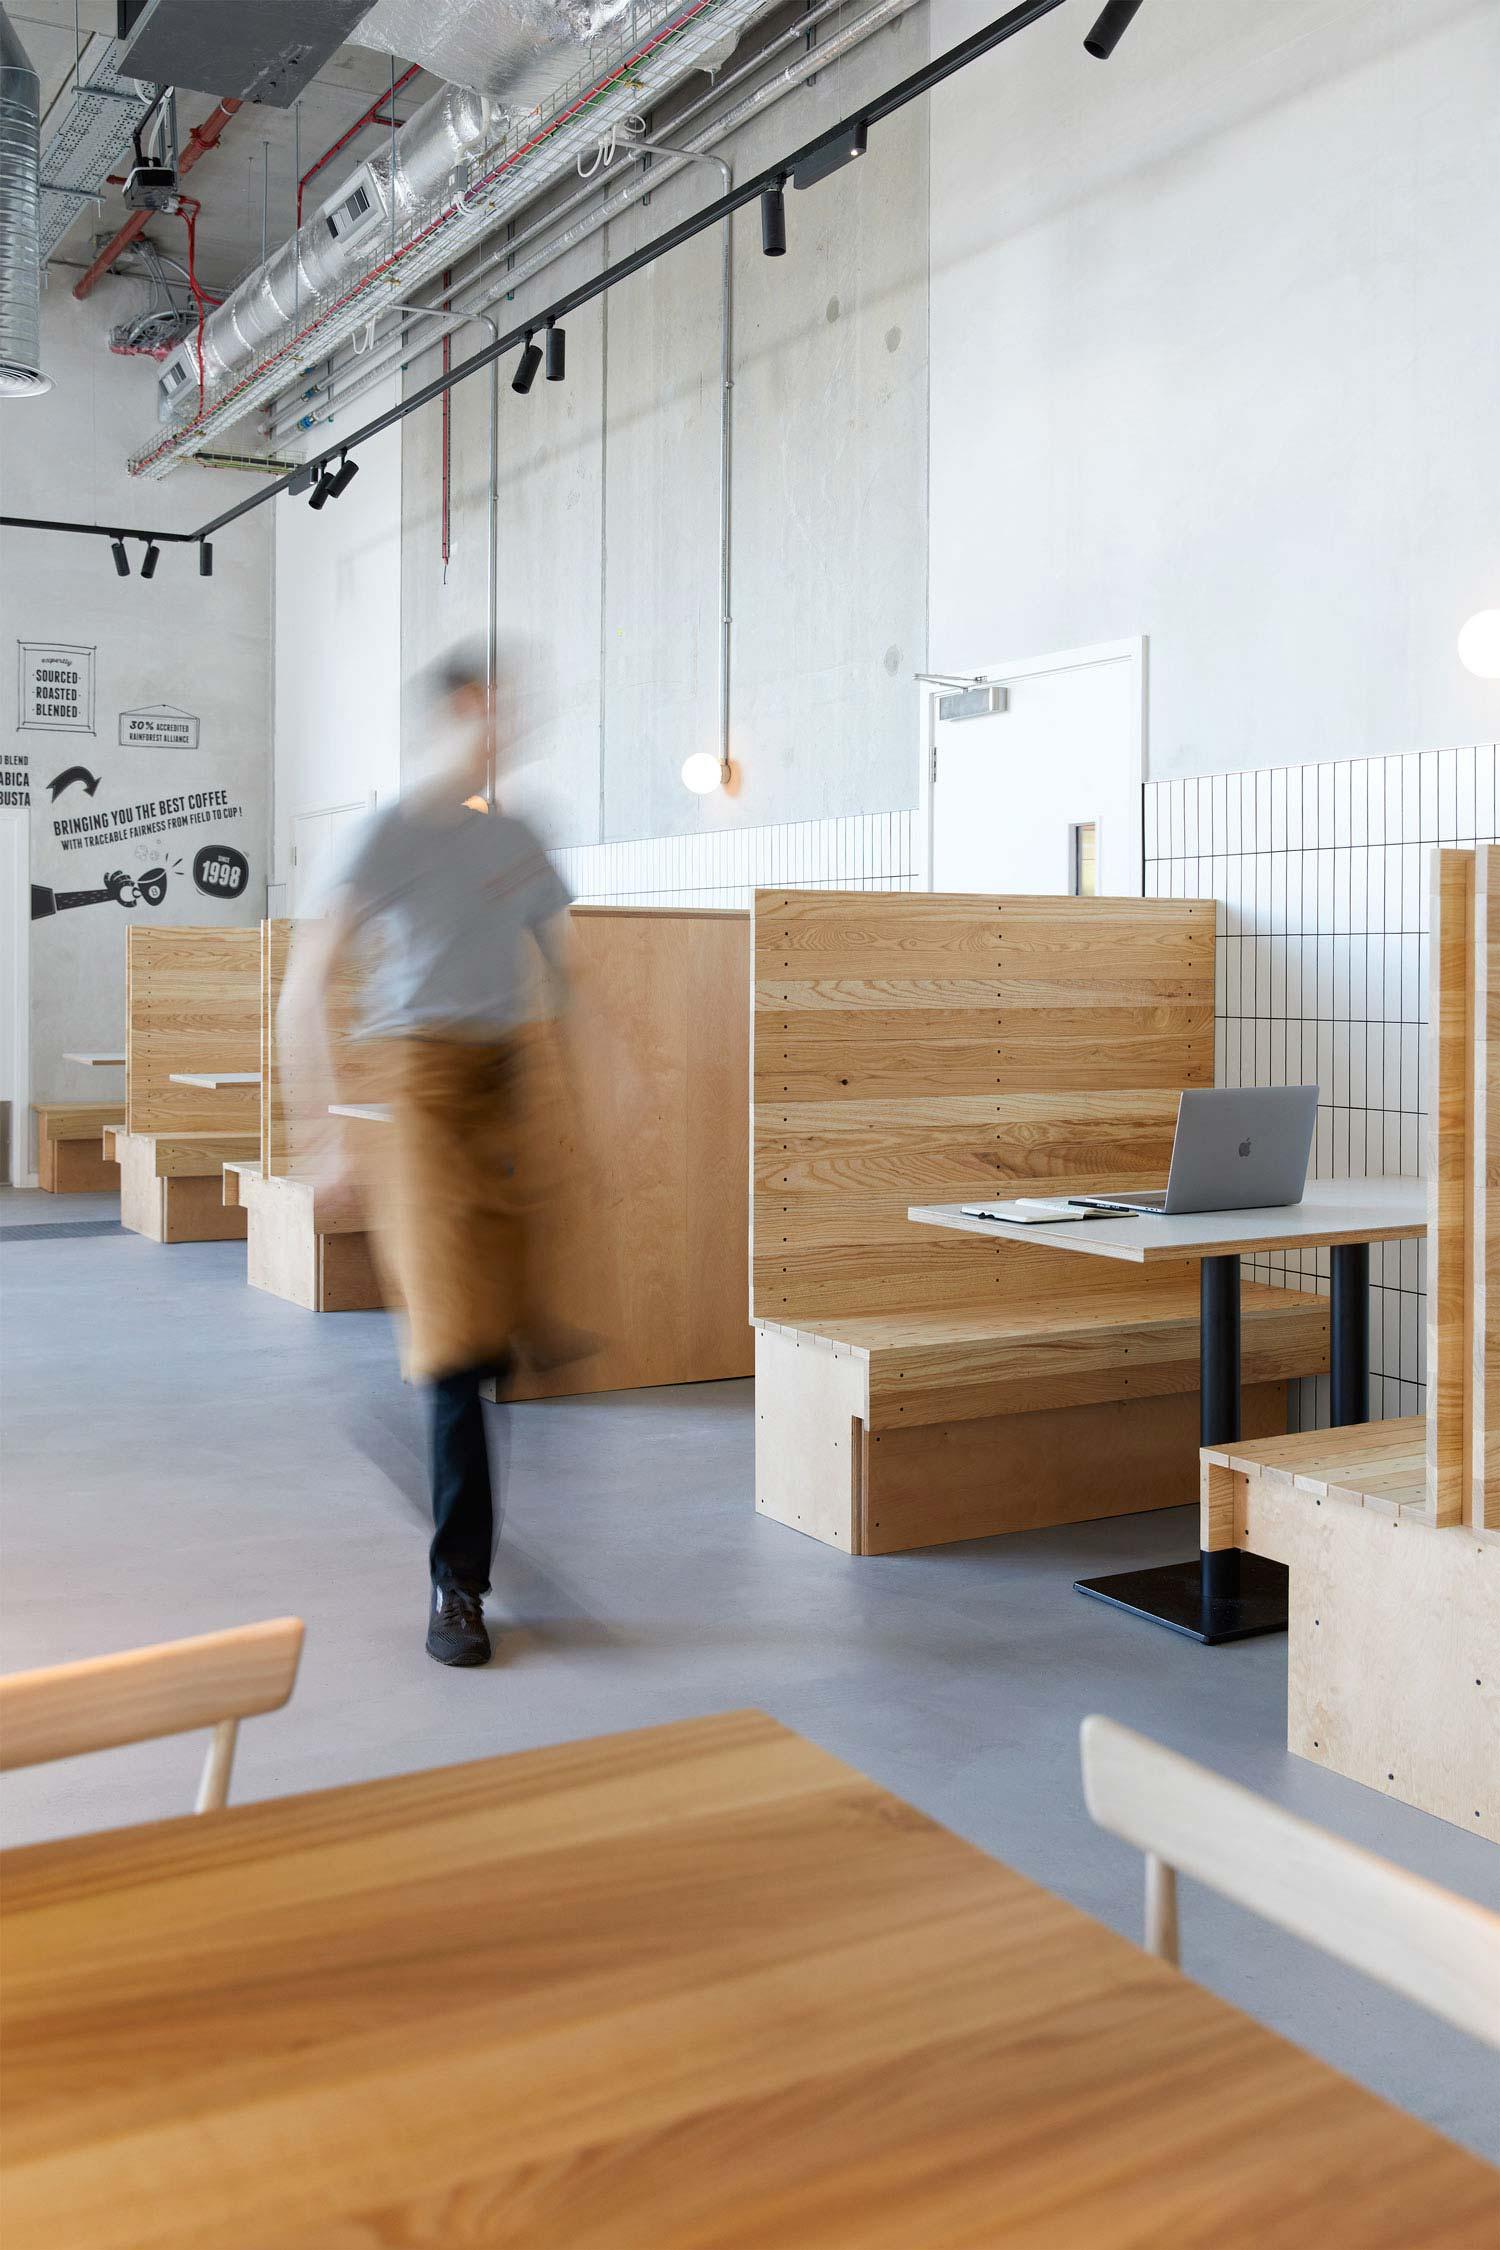 Architecture-London-Design-Freehaus-Workspace-Imperial-College-6.jpg